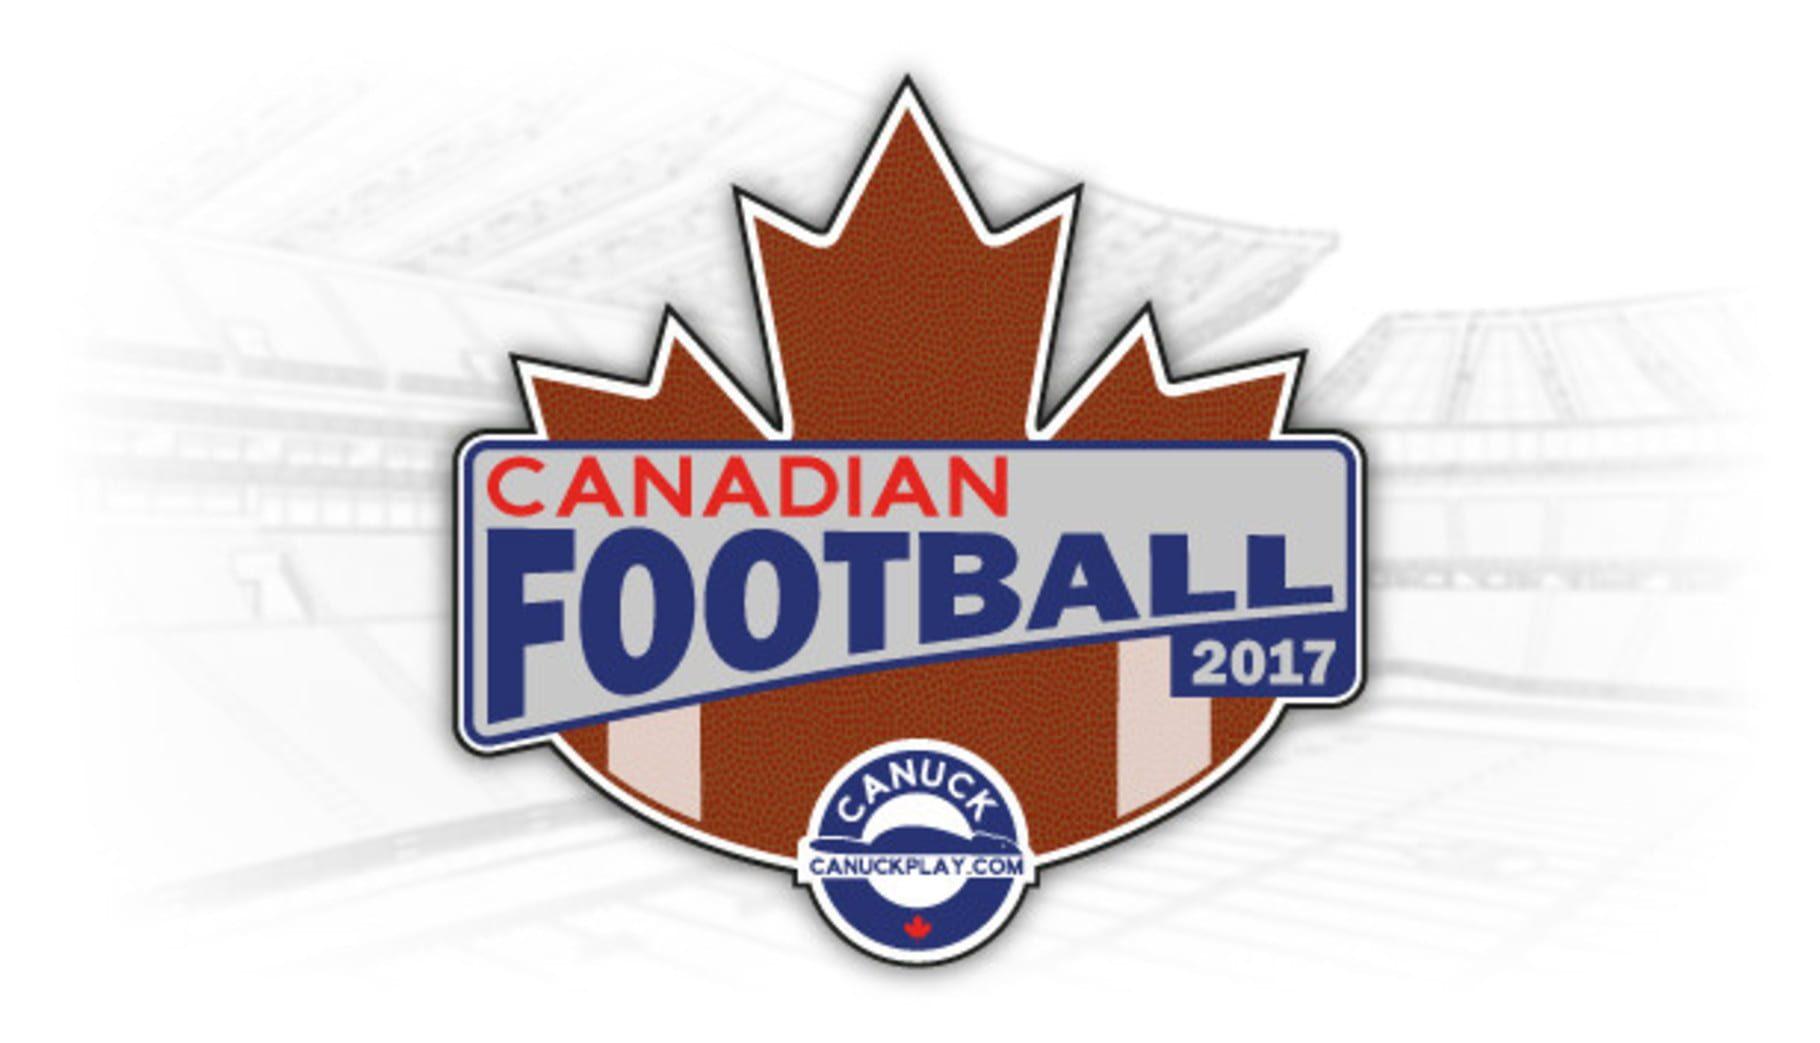 buy Canadian Football 2017 cd key for all platform